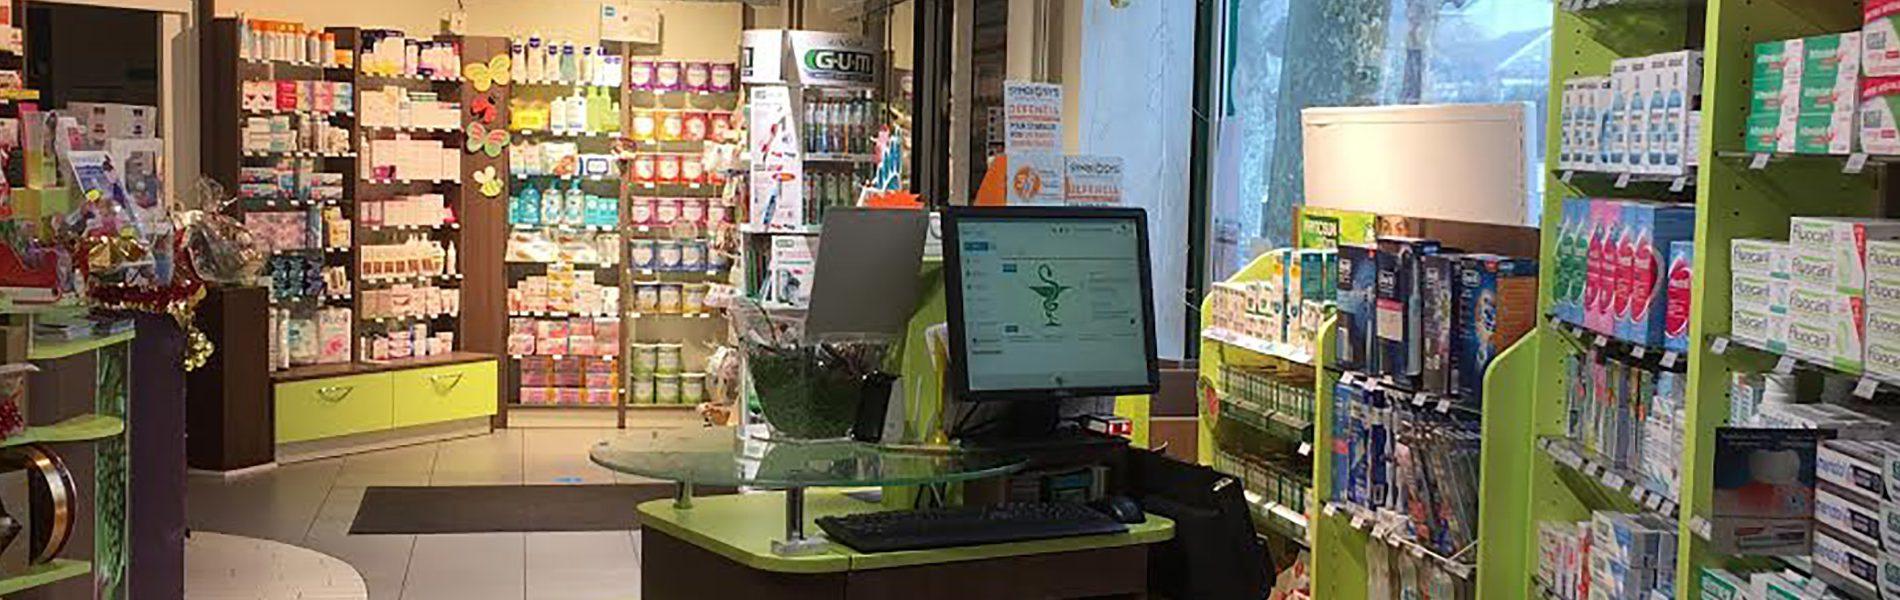 Pharmacie DE LA GARE - Image Homepage 2